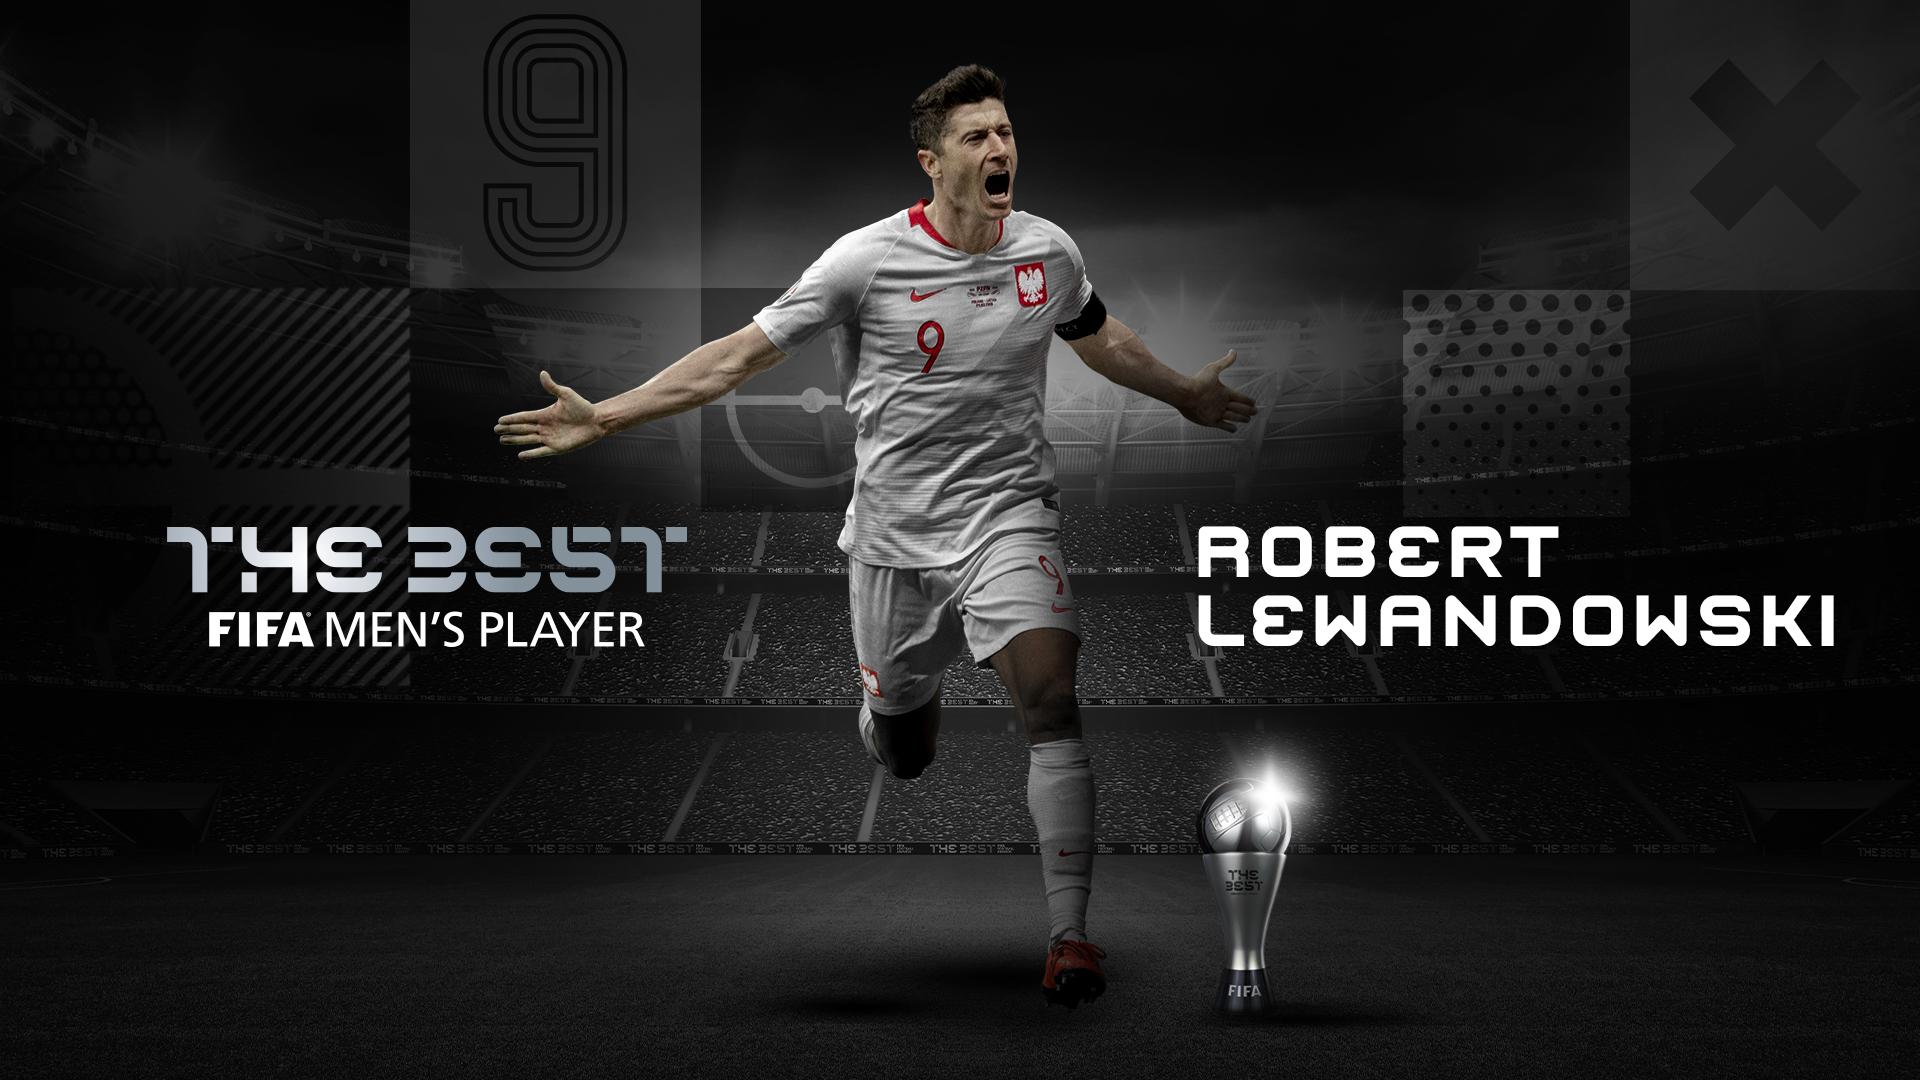 Robert Lewandowski wins FIFA player of the year